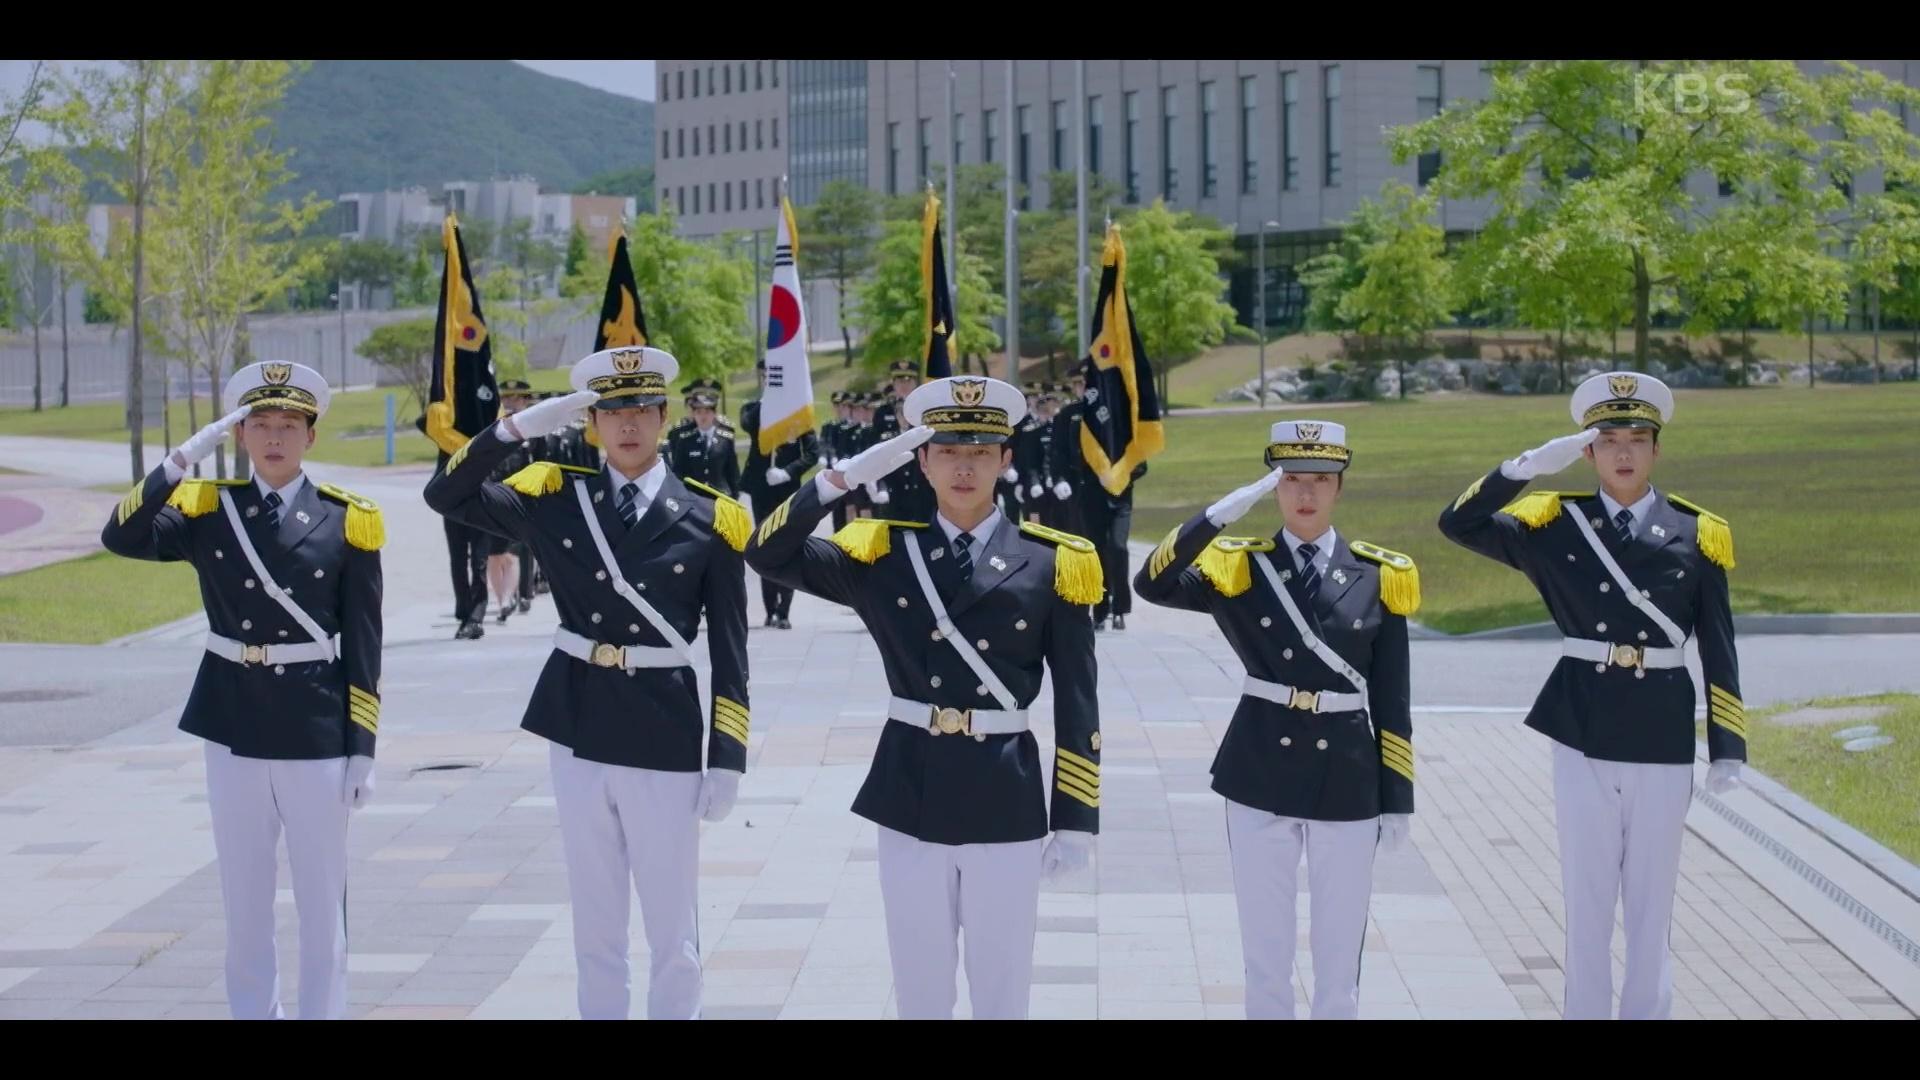 KBS Police University Korean Drama Review